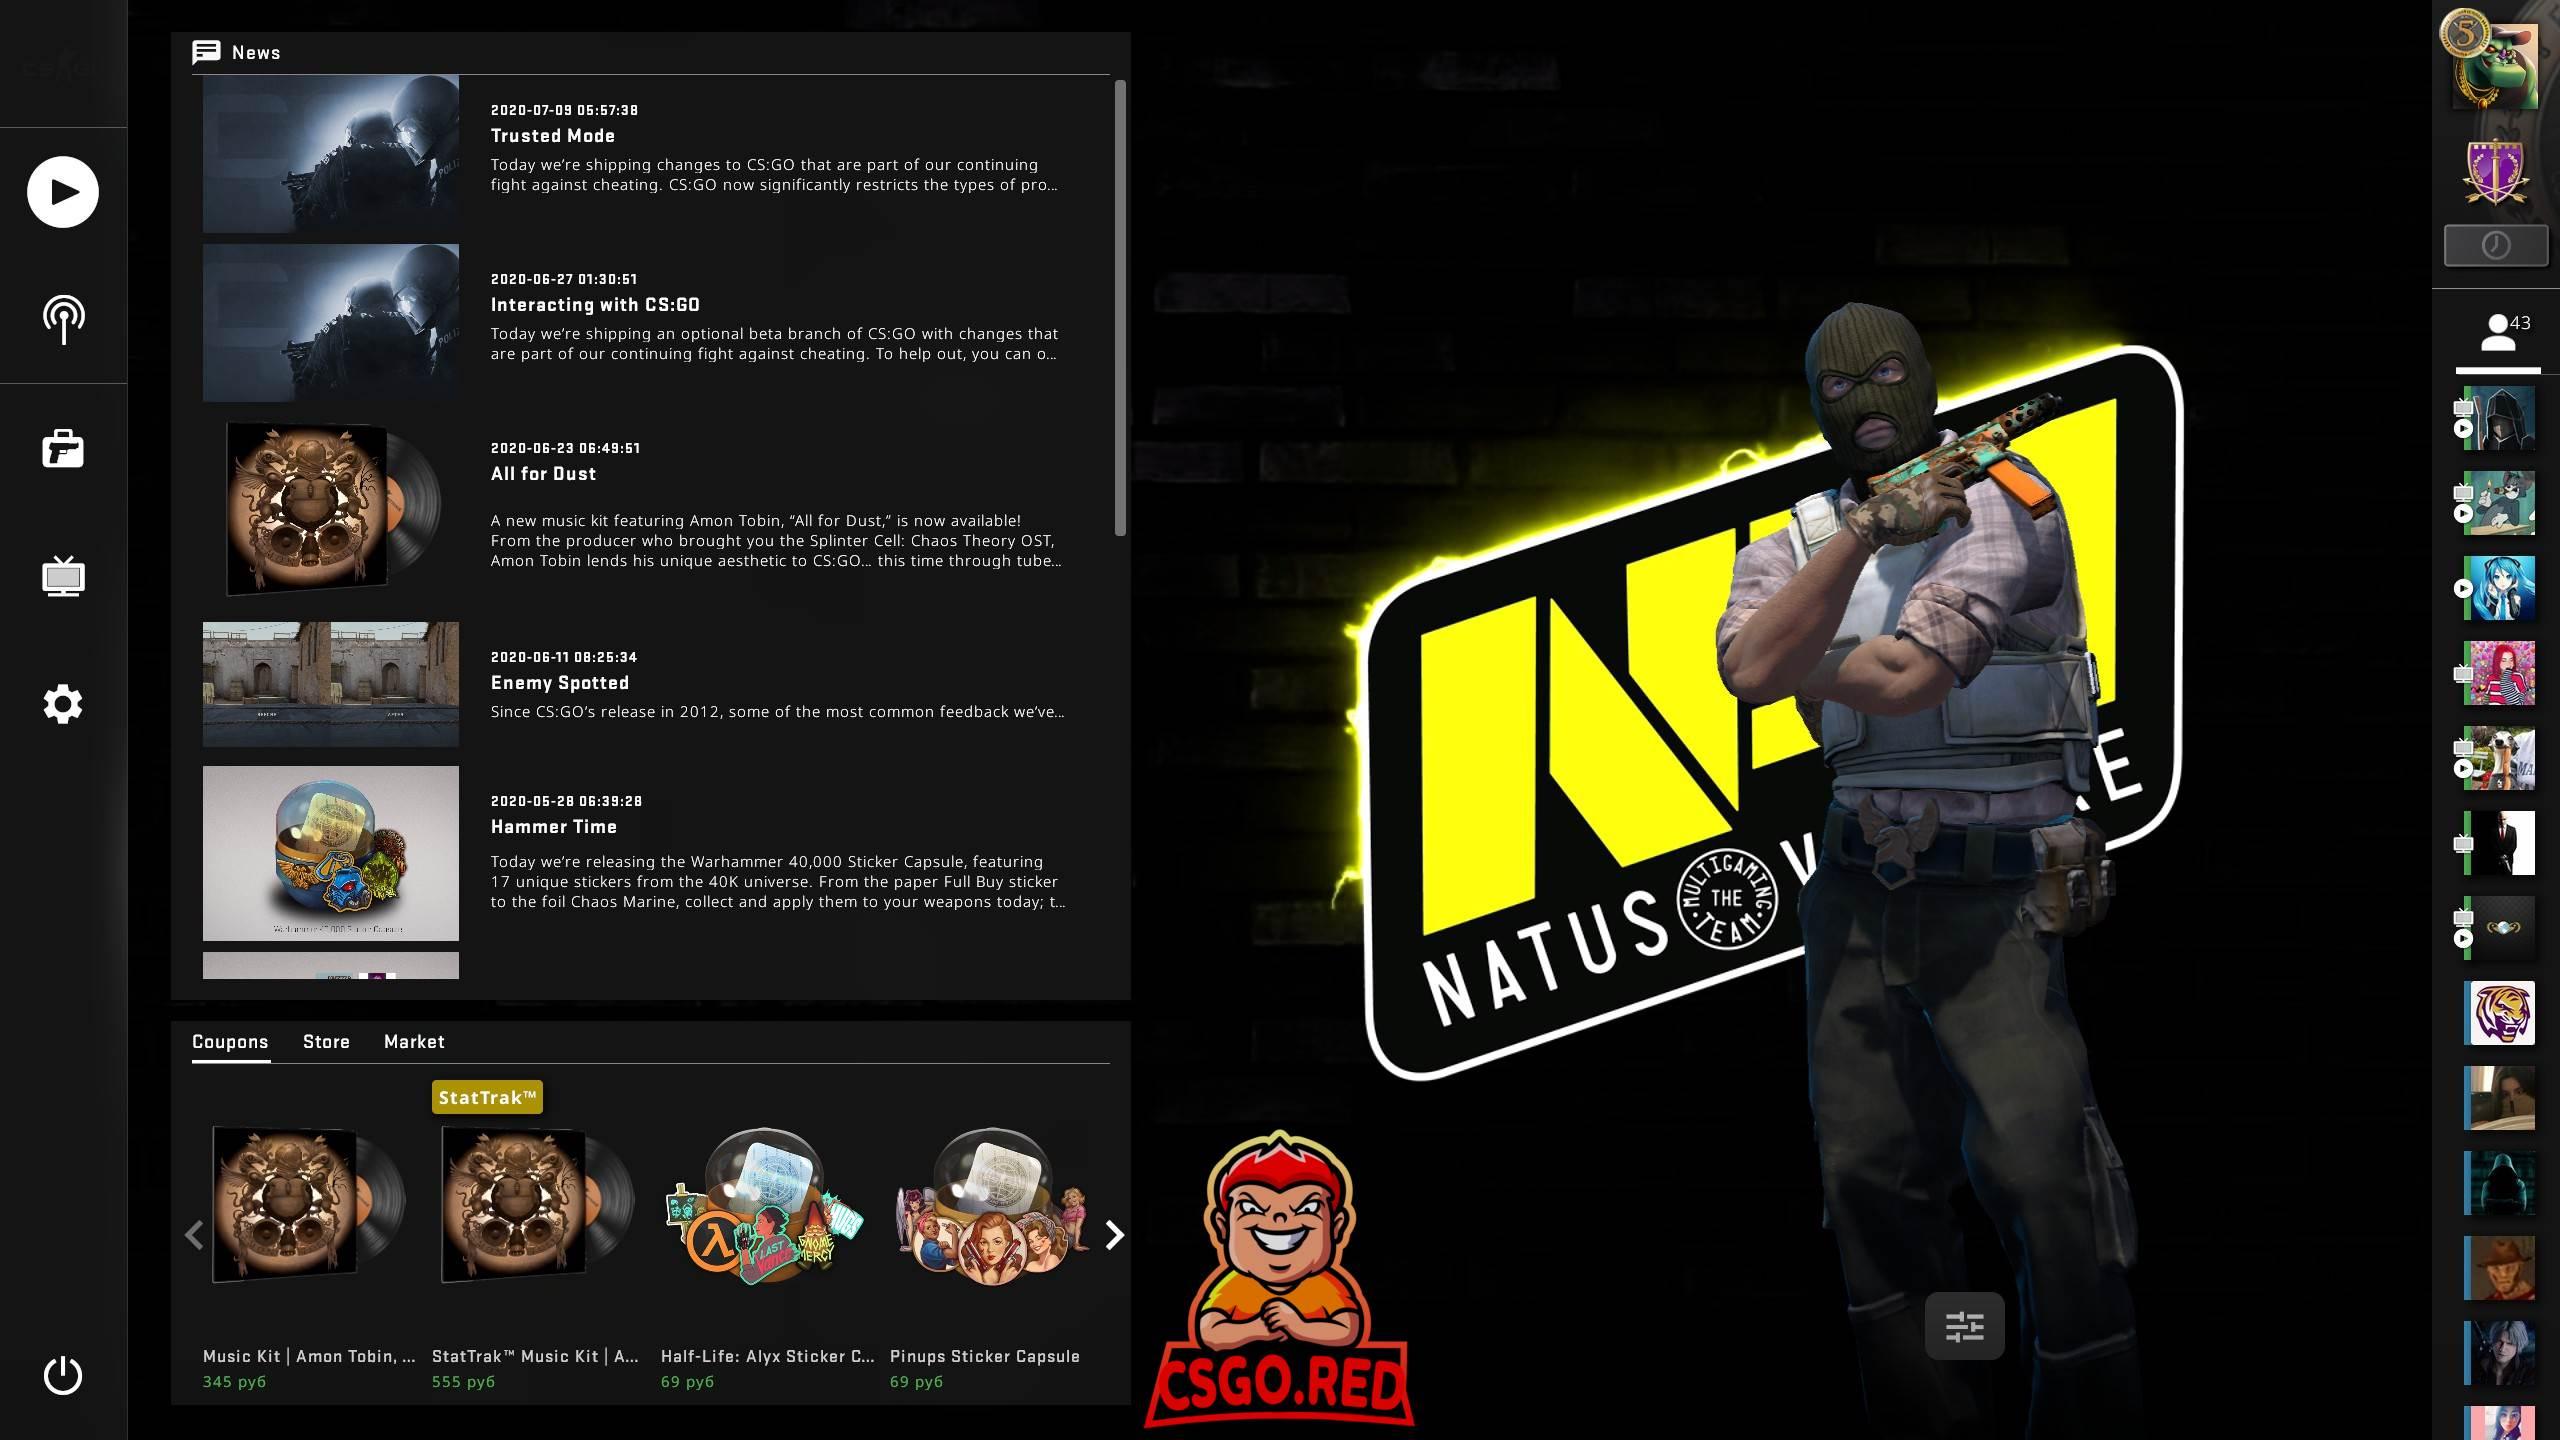 NAVI Animated Panorama UI Background